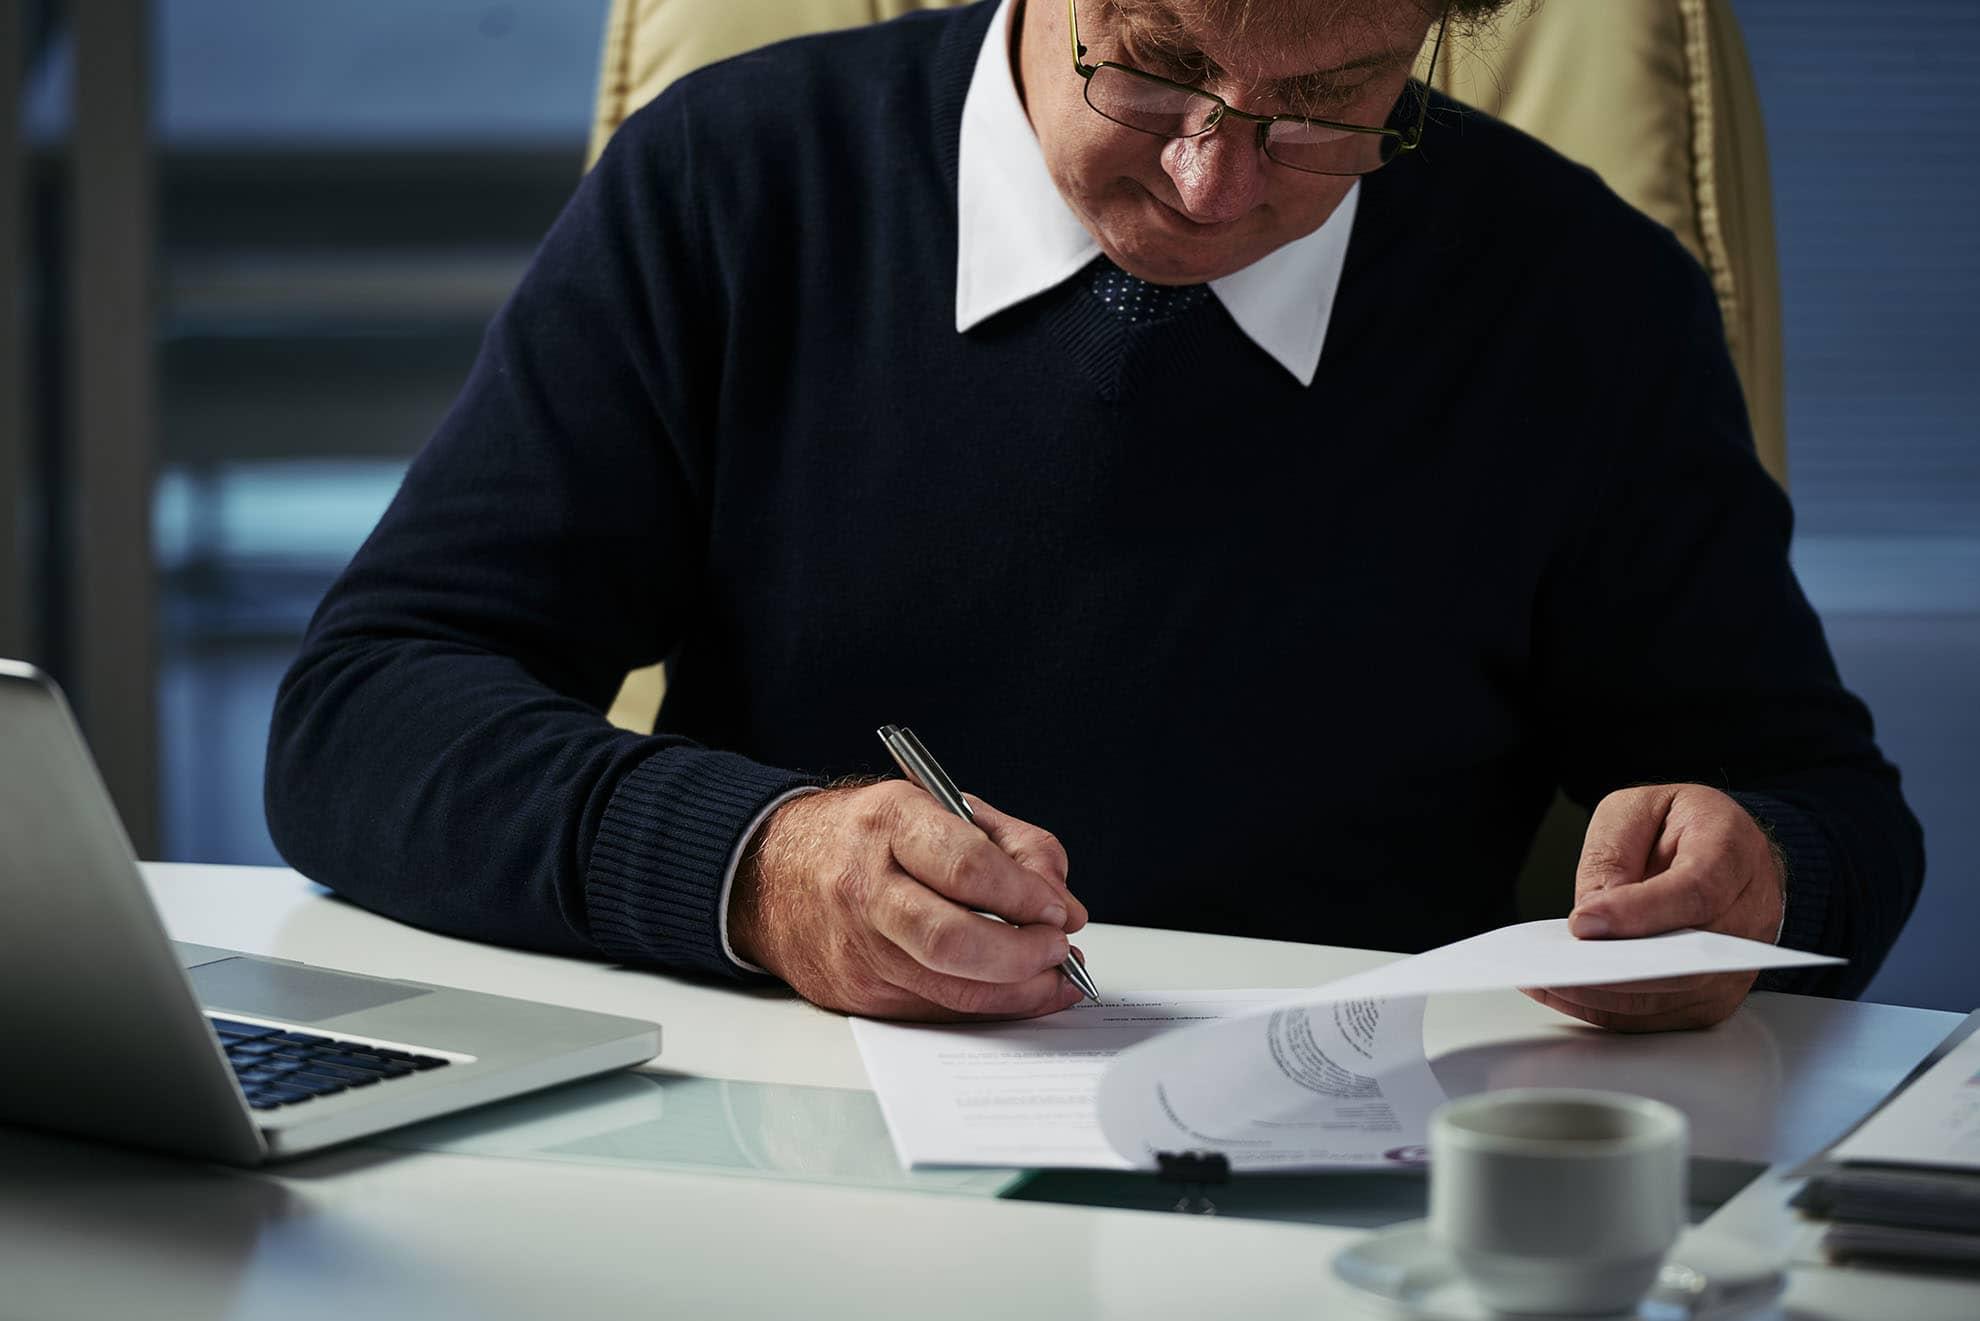 checking-documents-XB5MZUJ-min